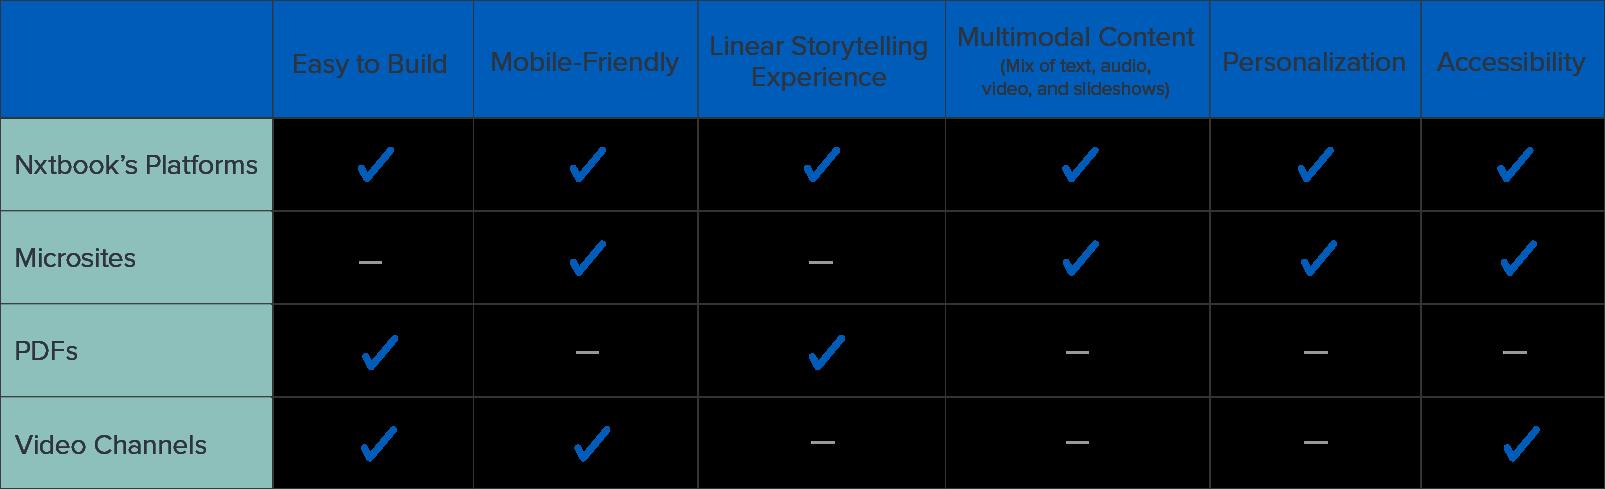 Comparison graph of platforms, based on content experiences